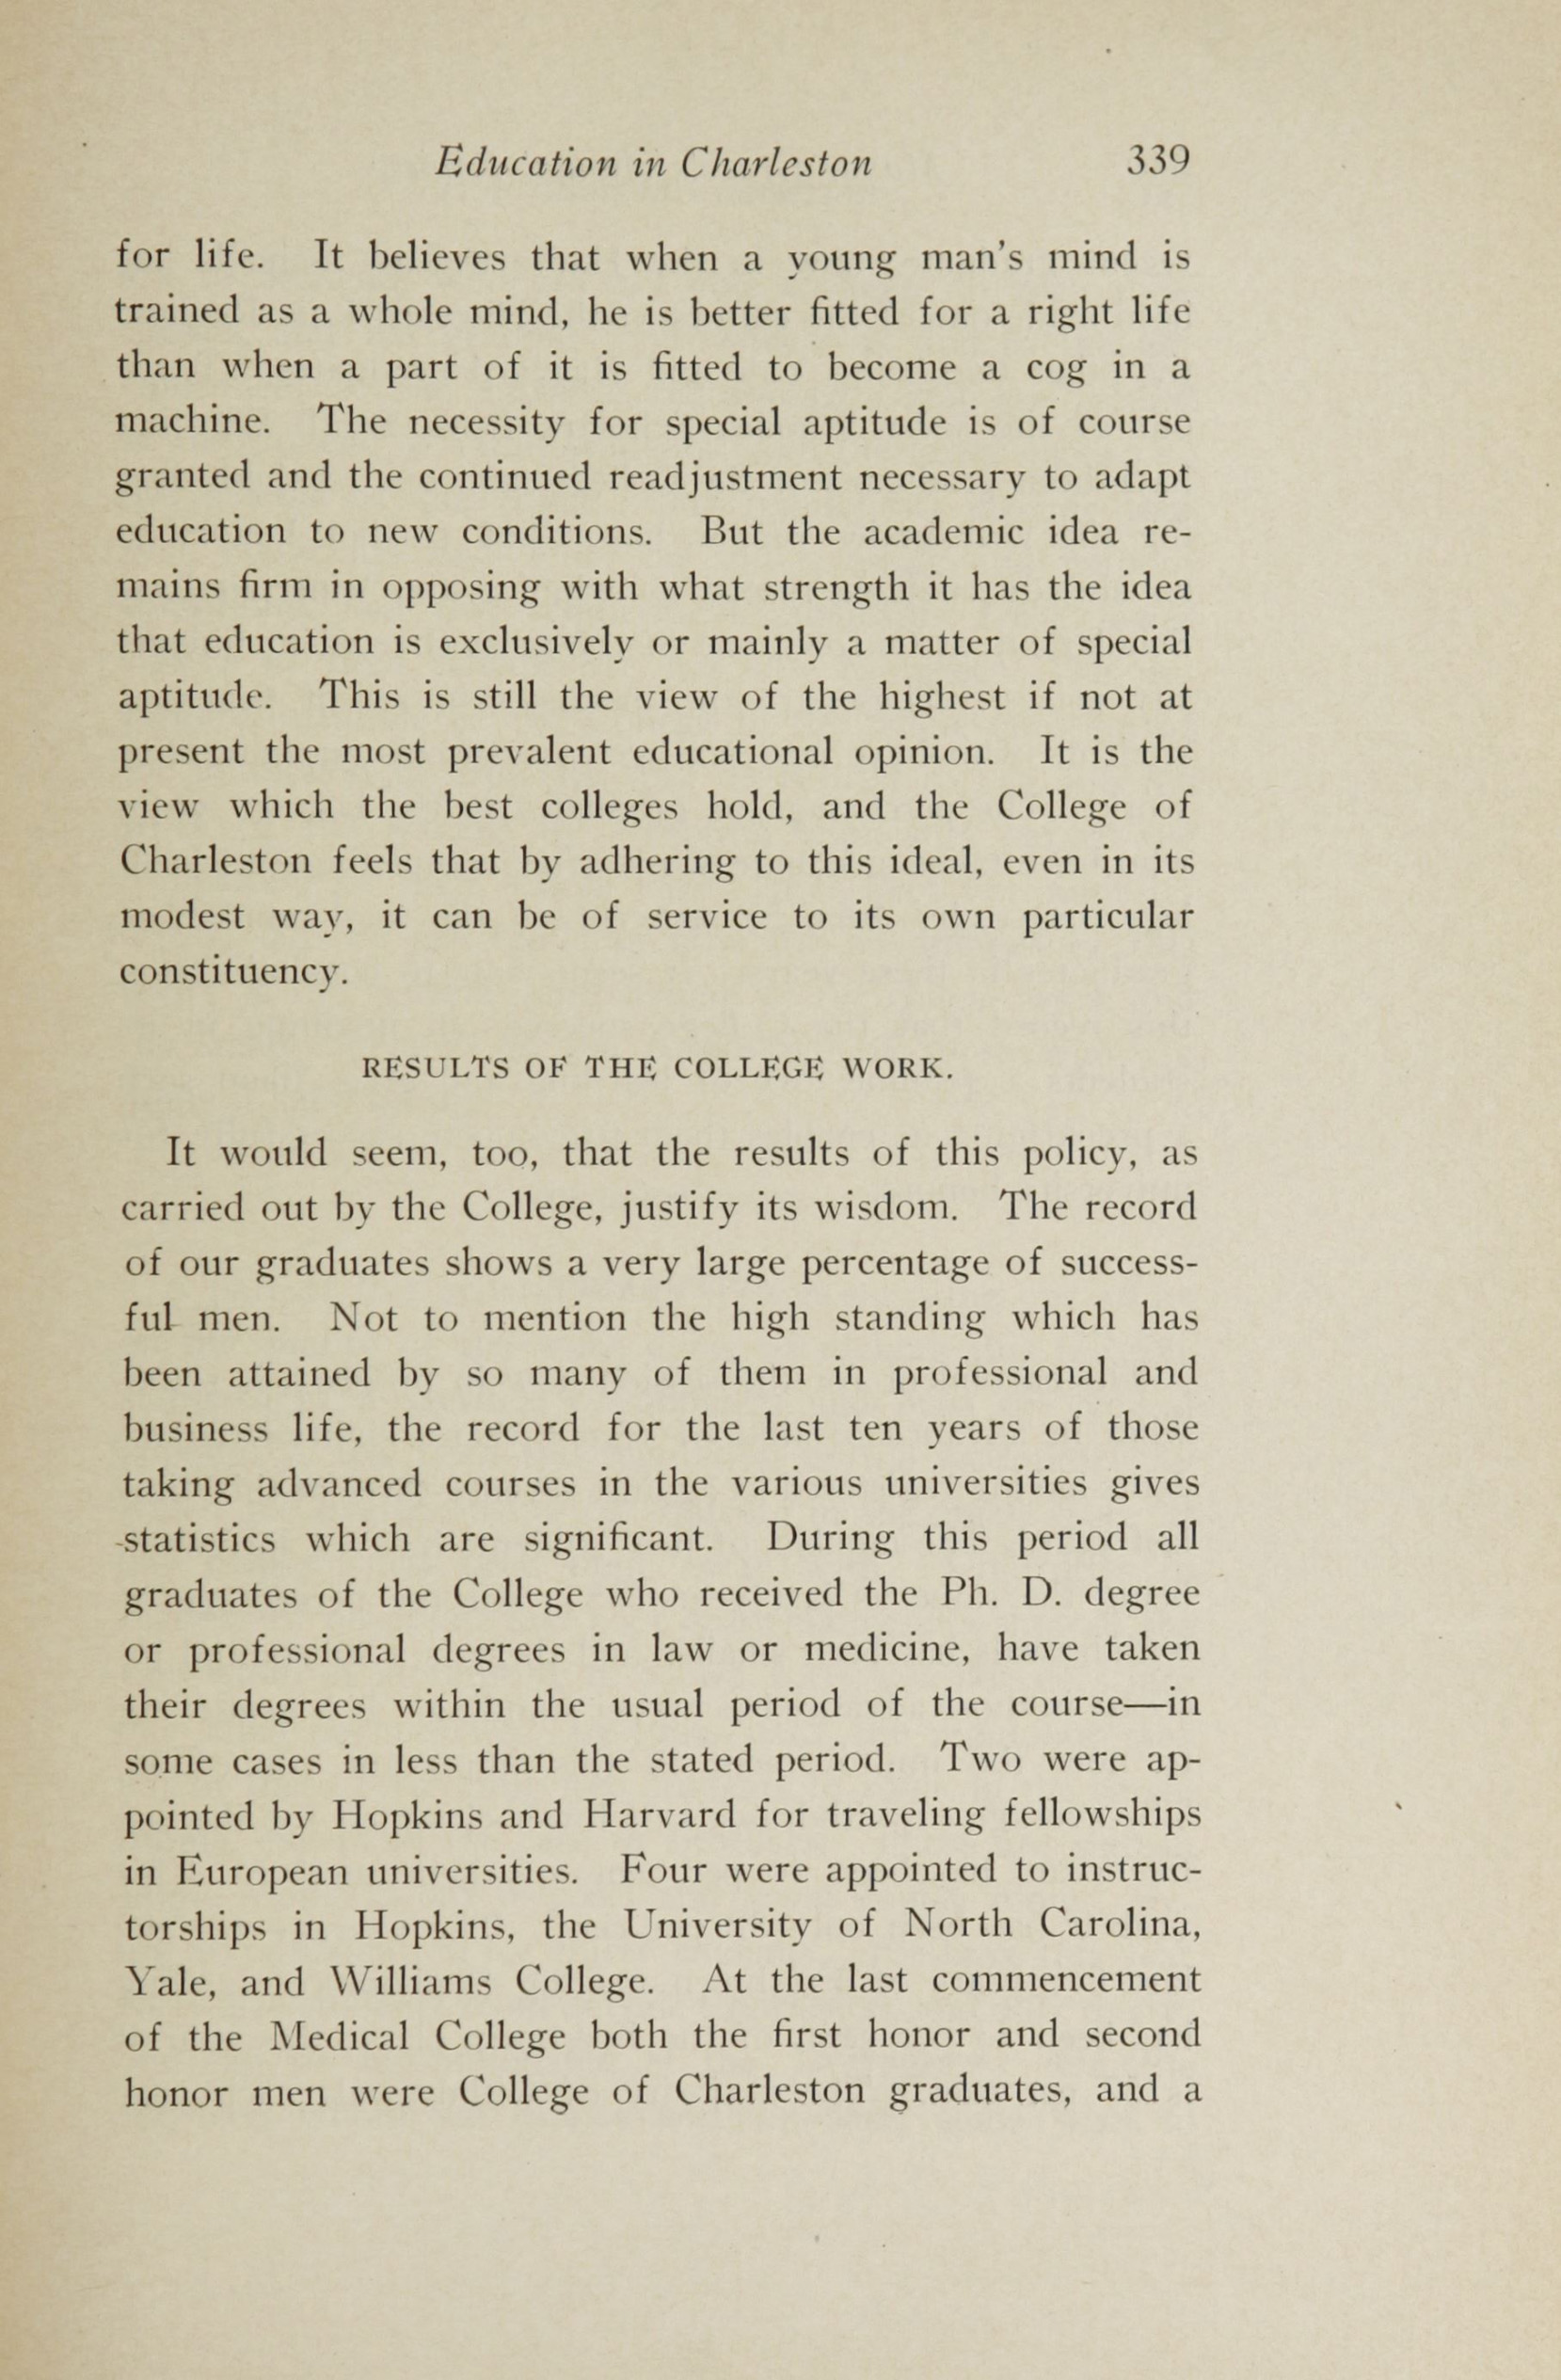 Charleston Yearbook, 1913, page 339